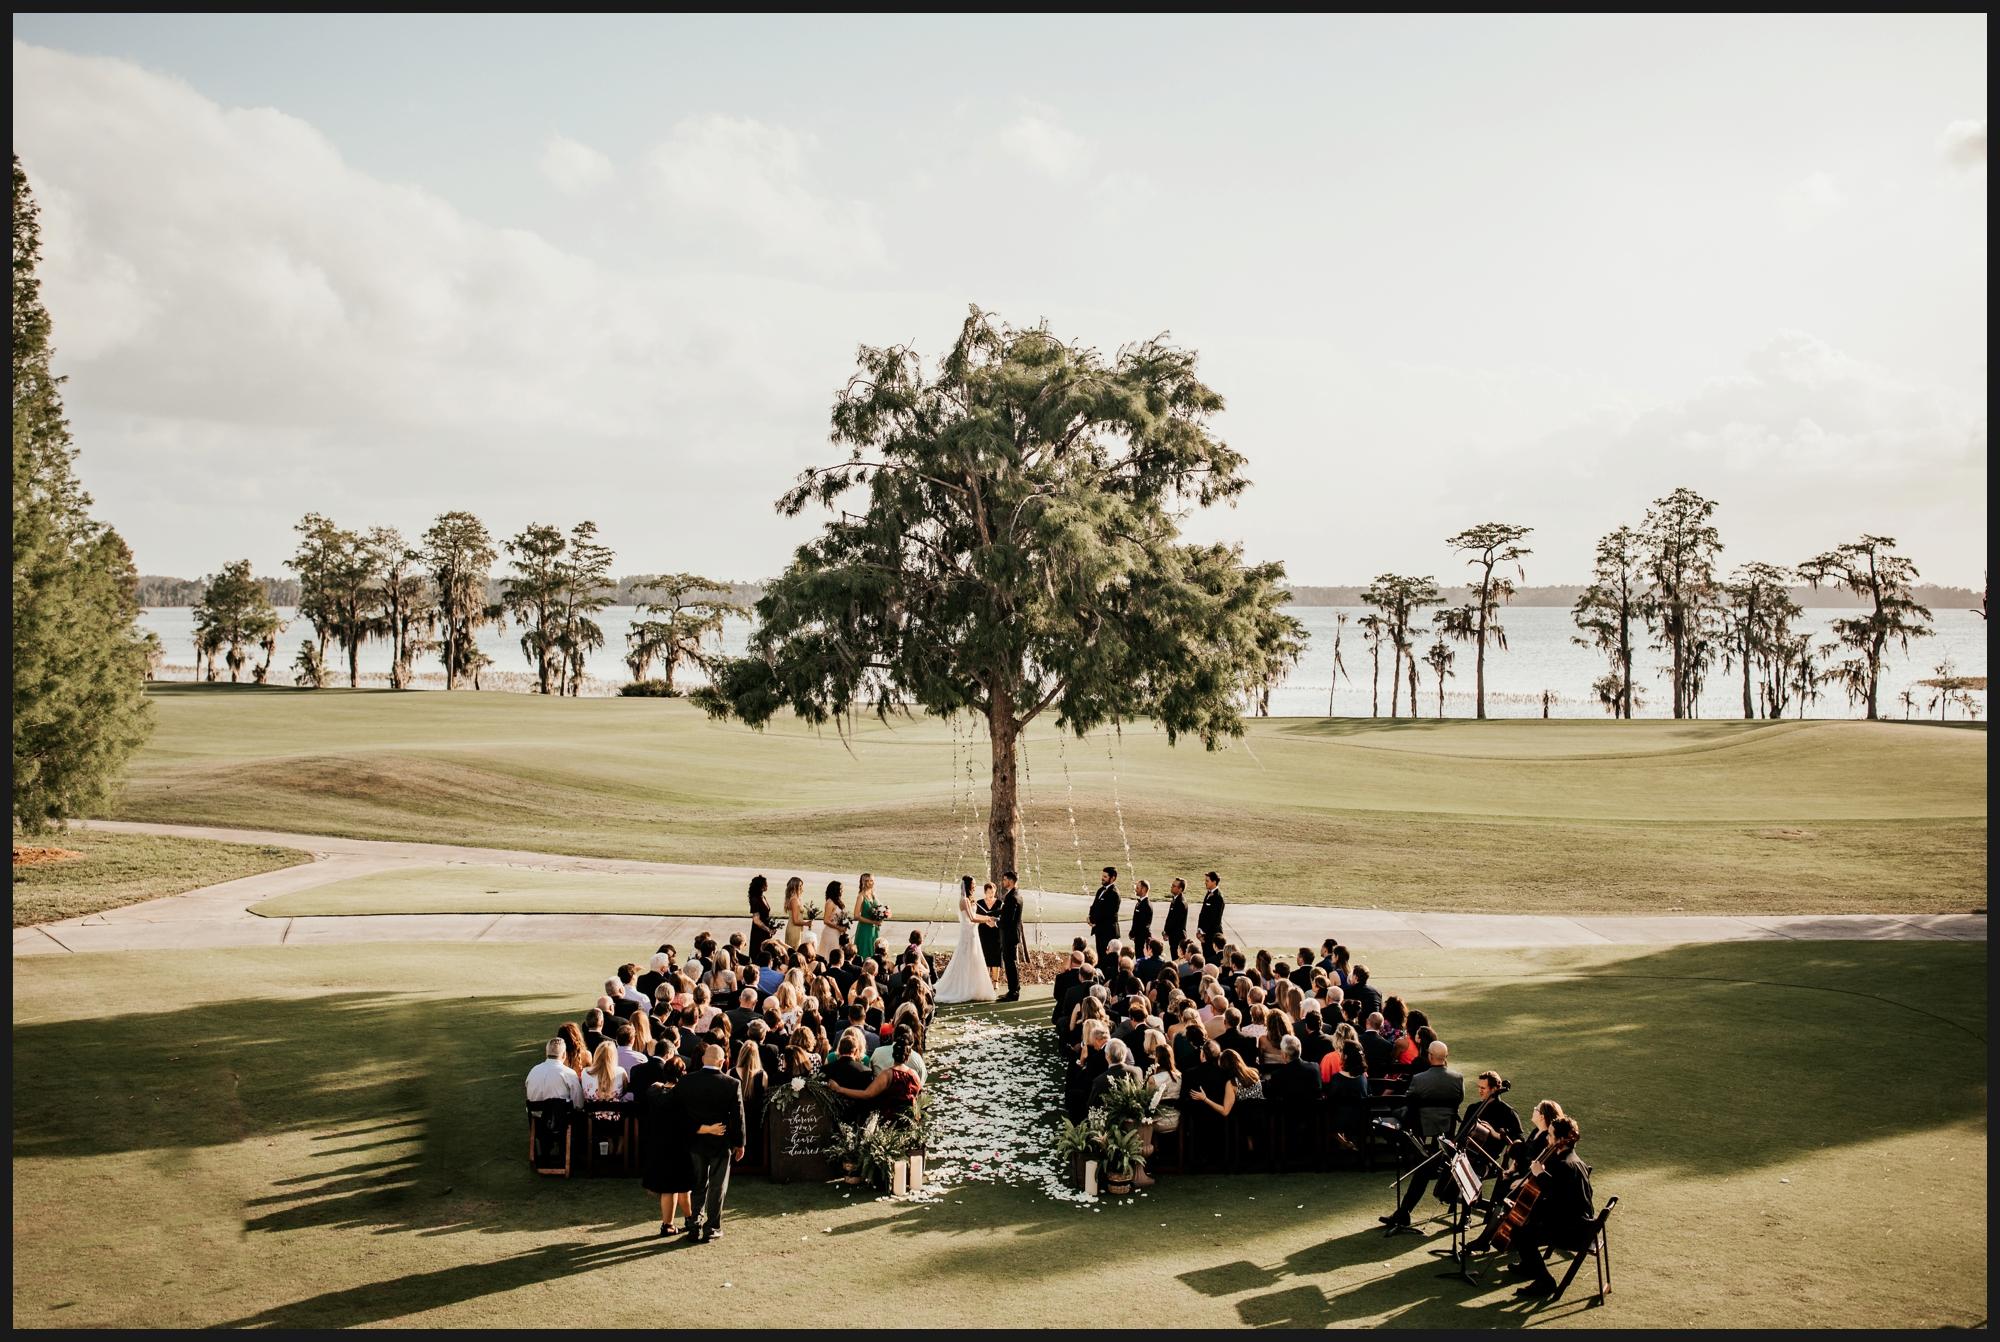 Orlando-Wedding-Photographer-destination-wedding-photographer-florida-wedding-photographer-hawaii-wedding-photographer_0227.jpg